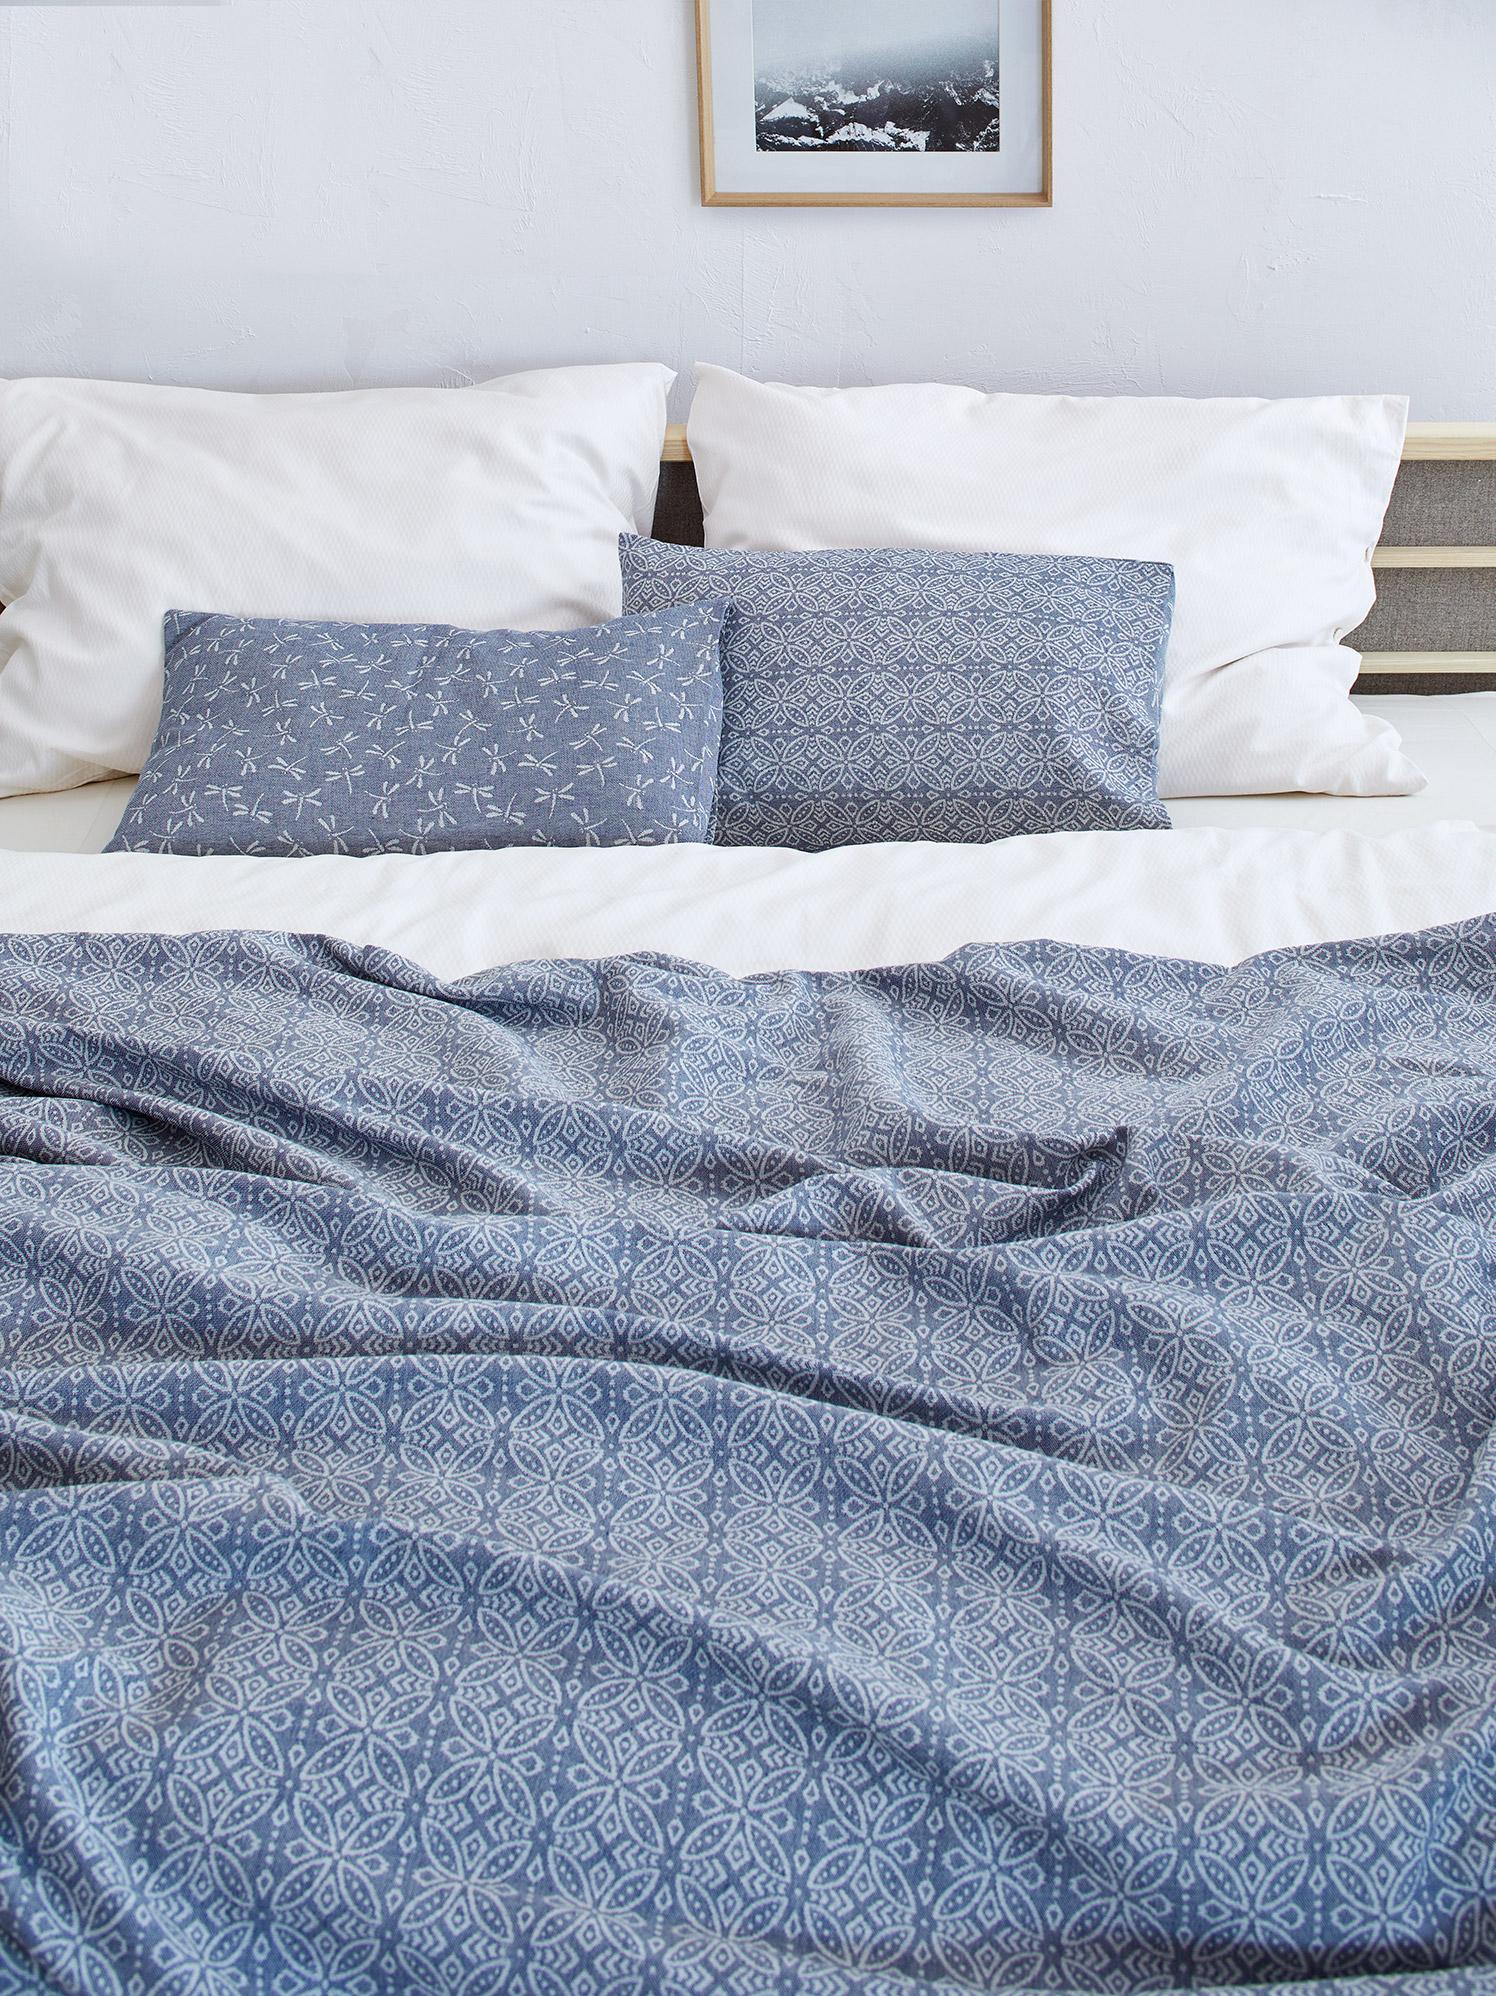 bett berwurf florentine 240 x 240 cm gr ne erde. Black Bedroom Furniture Sets. Home Design Ideas